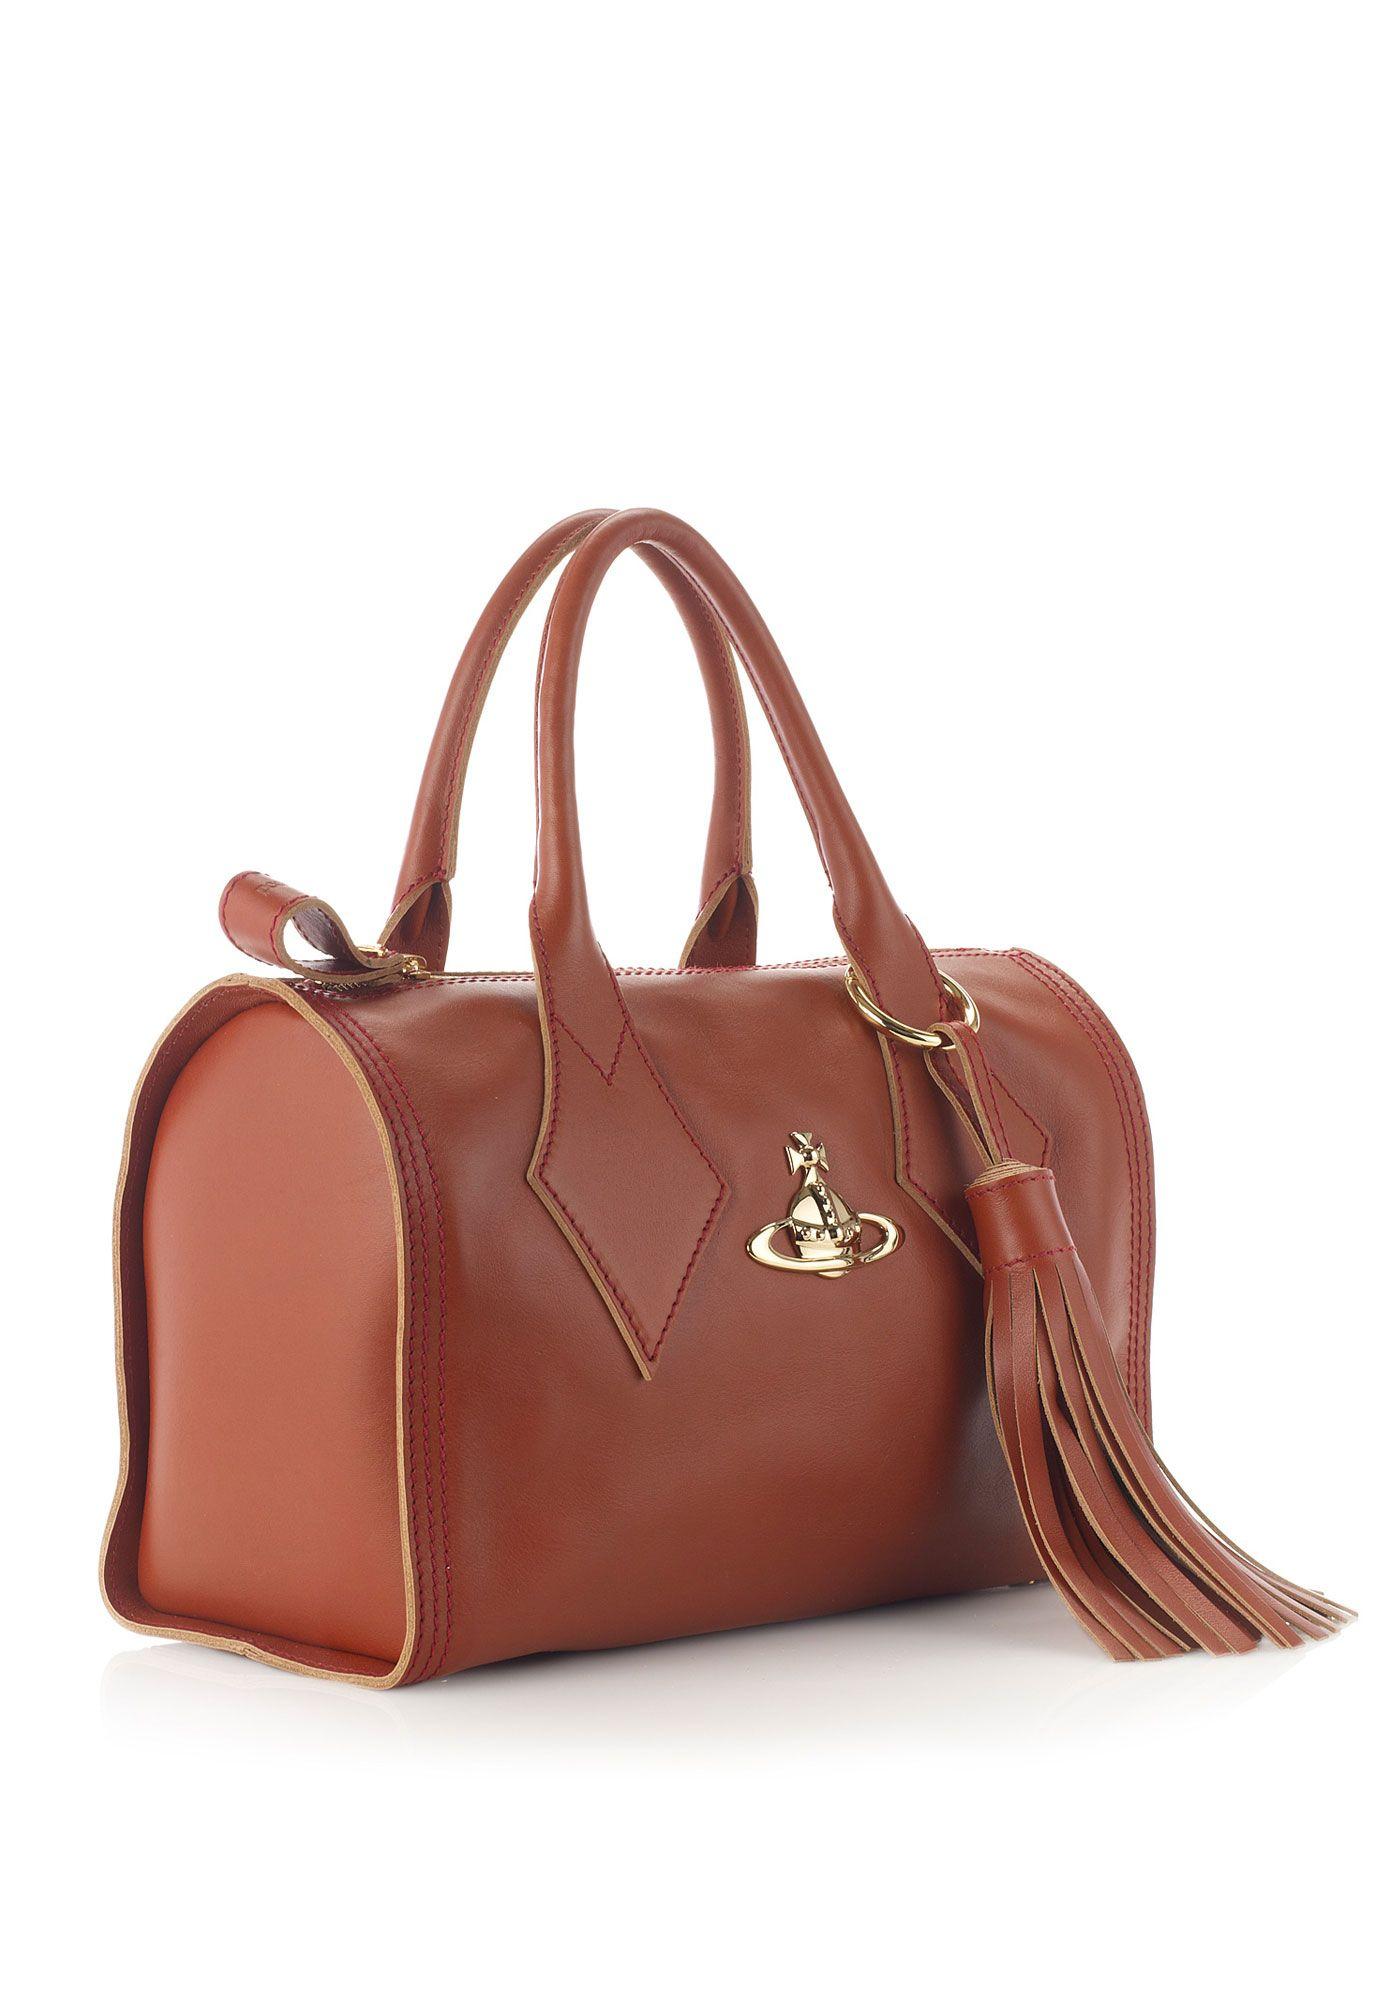 02712c77fae Dolce Vita Bag Red - Vivienne Westwood British Style, Clutch Purse, Vivienne  Westwood,